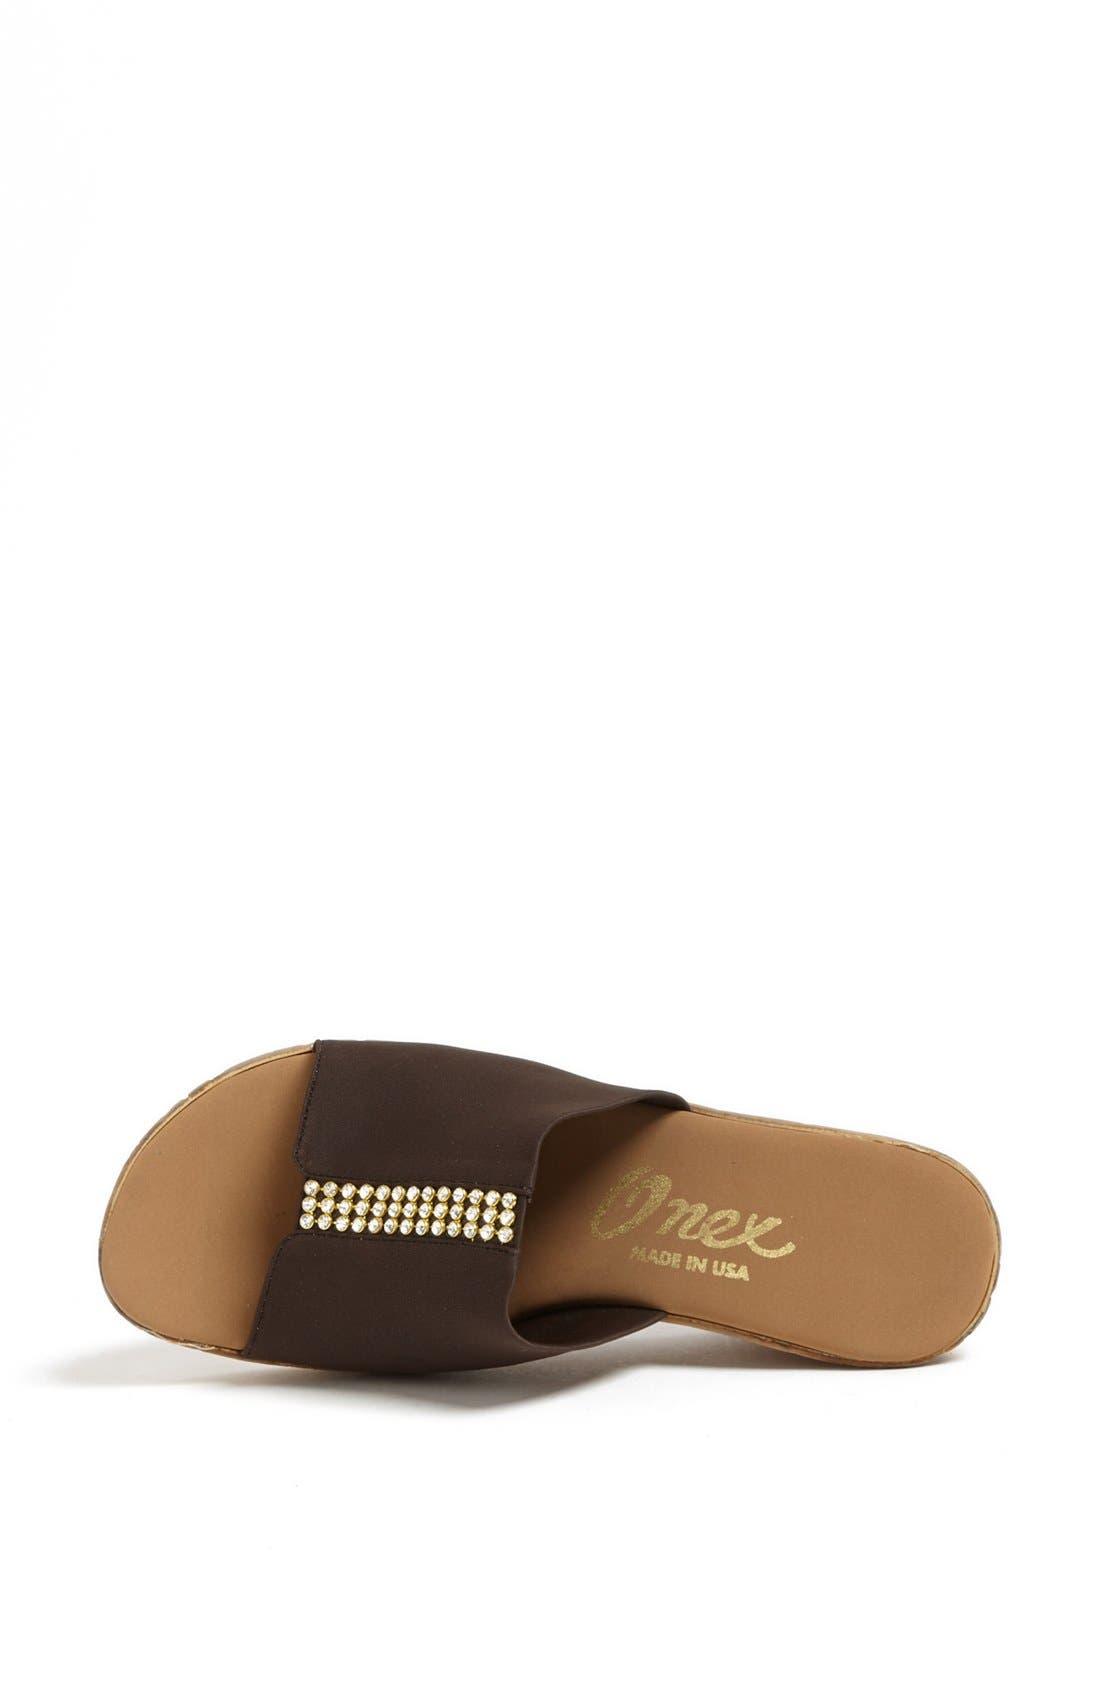 Alternate Image 3  - Onex 'Billie' Wedge Sandal